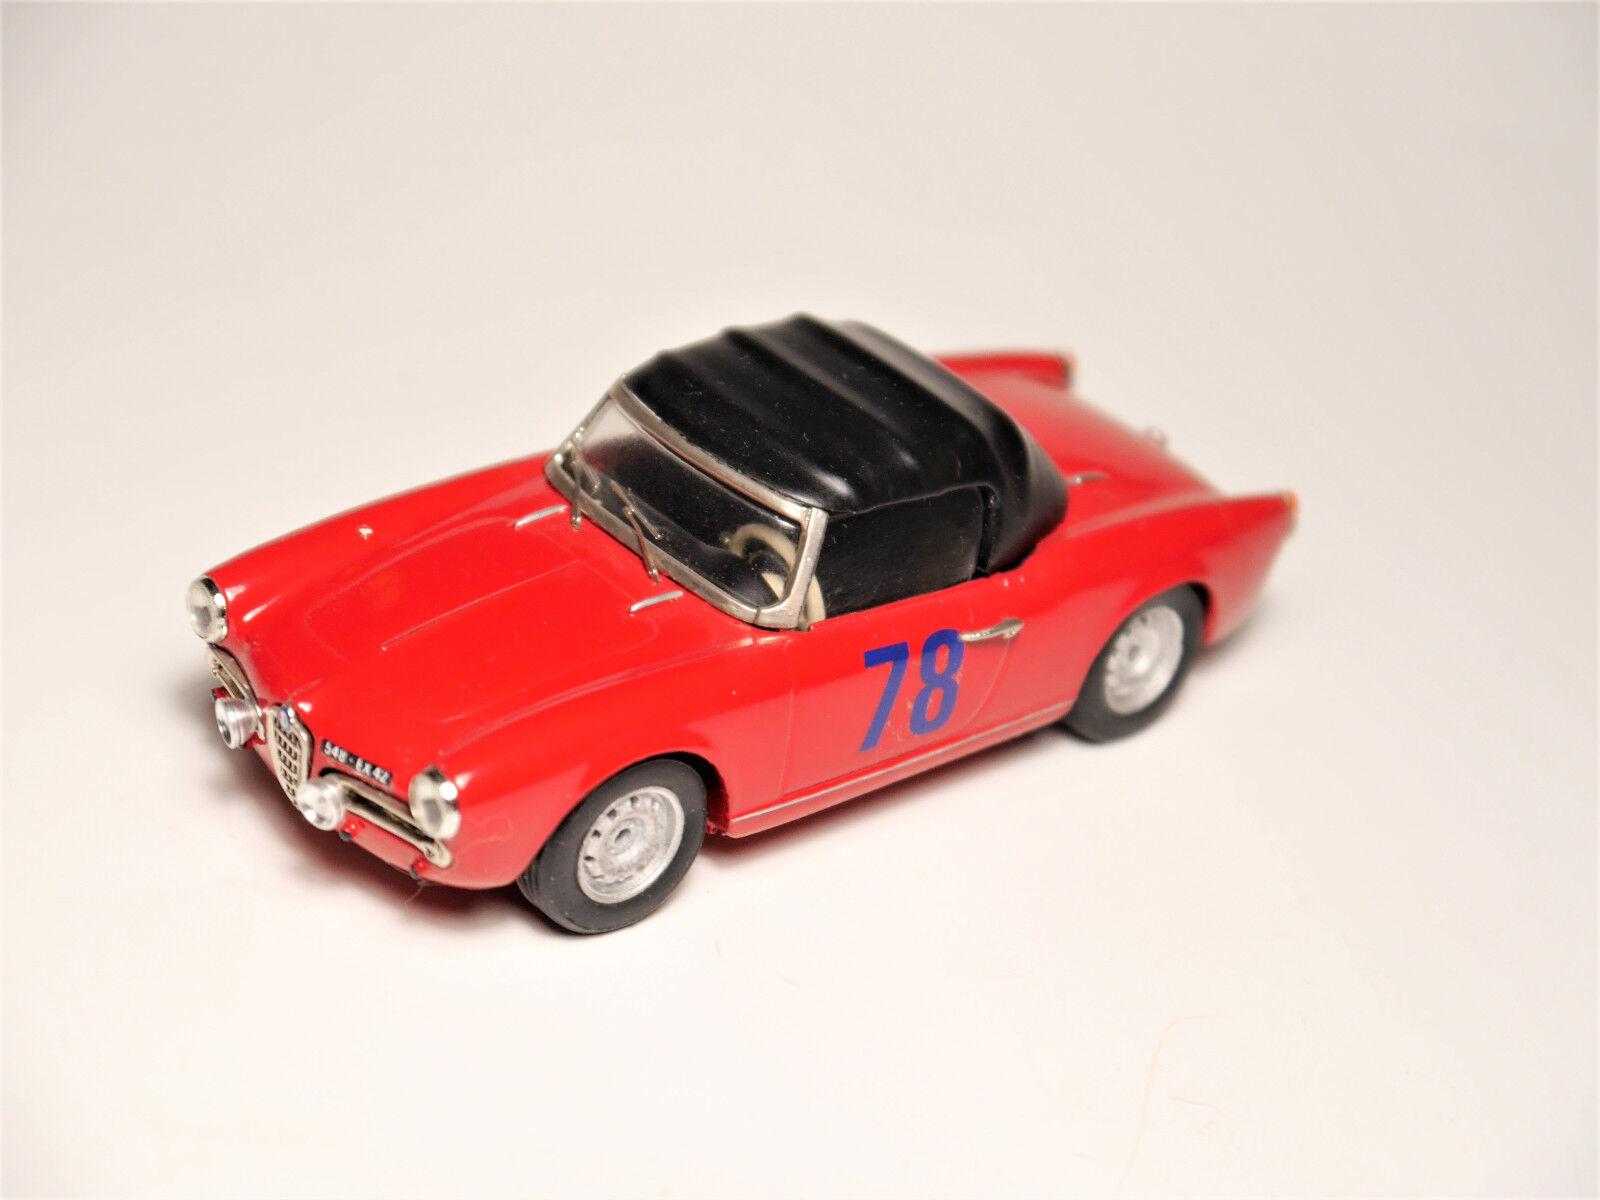 Alfa Romeo Giulietta Spider, Handarbeit Handarbeit Handarbeit handmade - Tron   Provence Moulage 1 43  d9b447